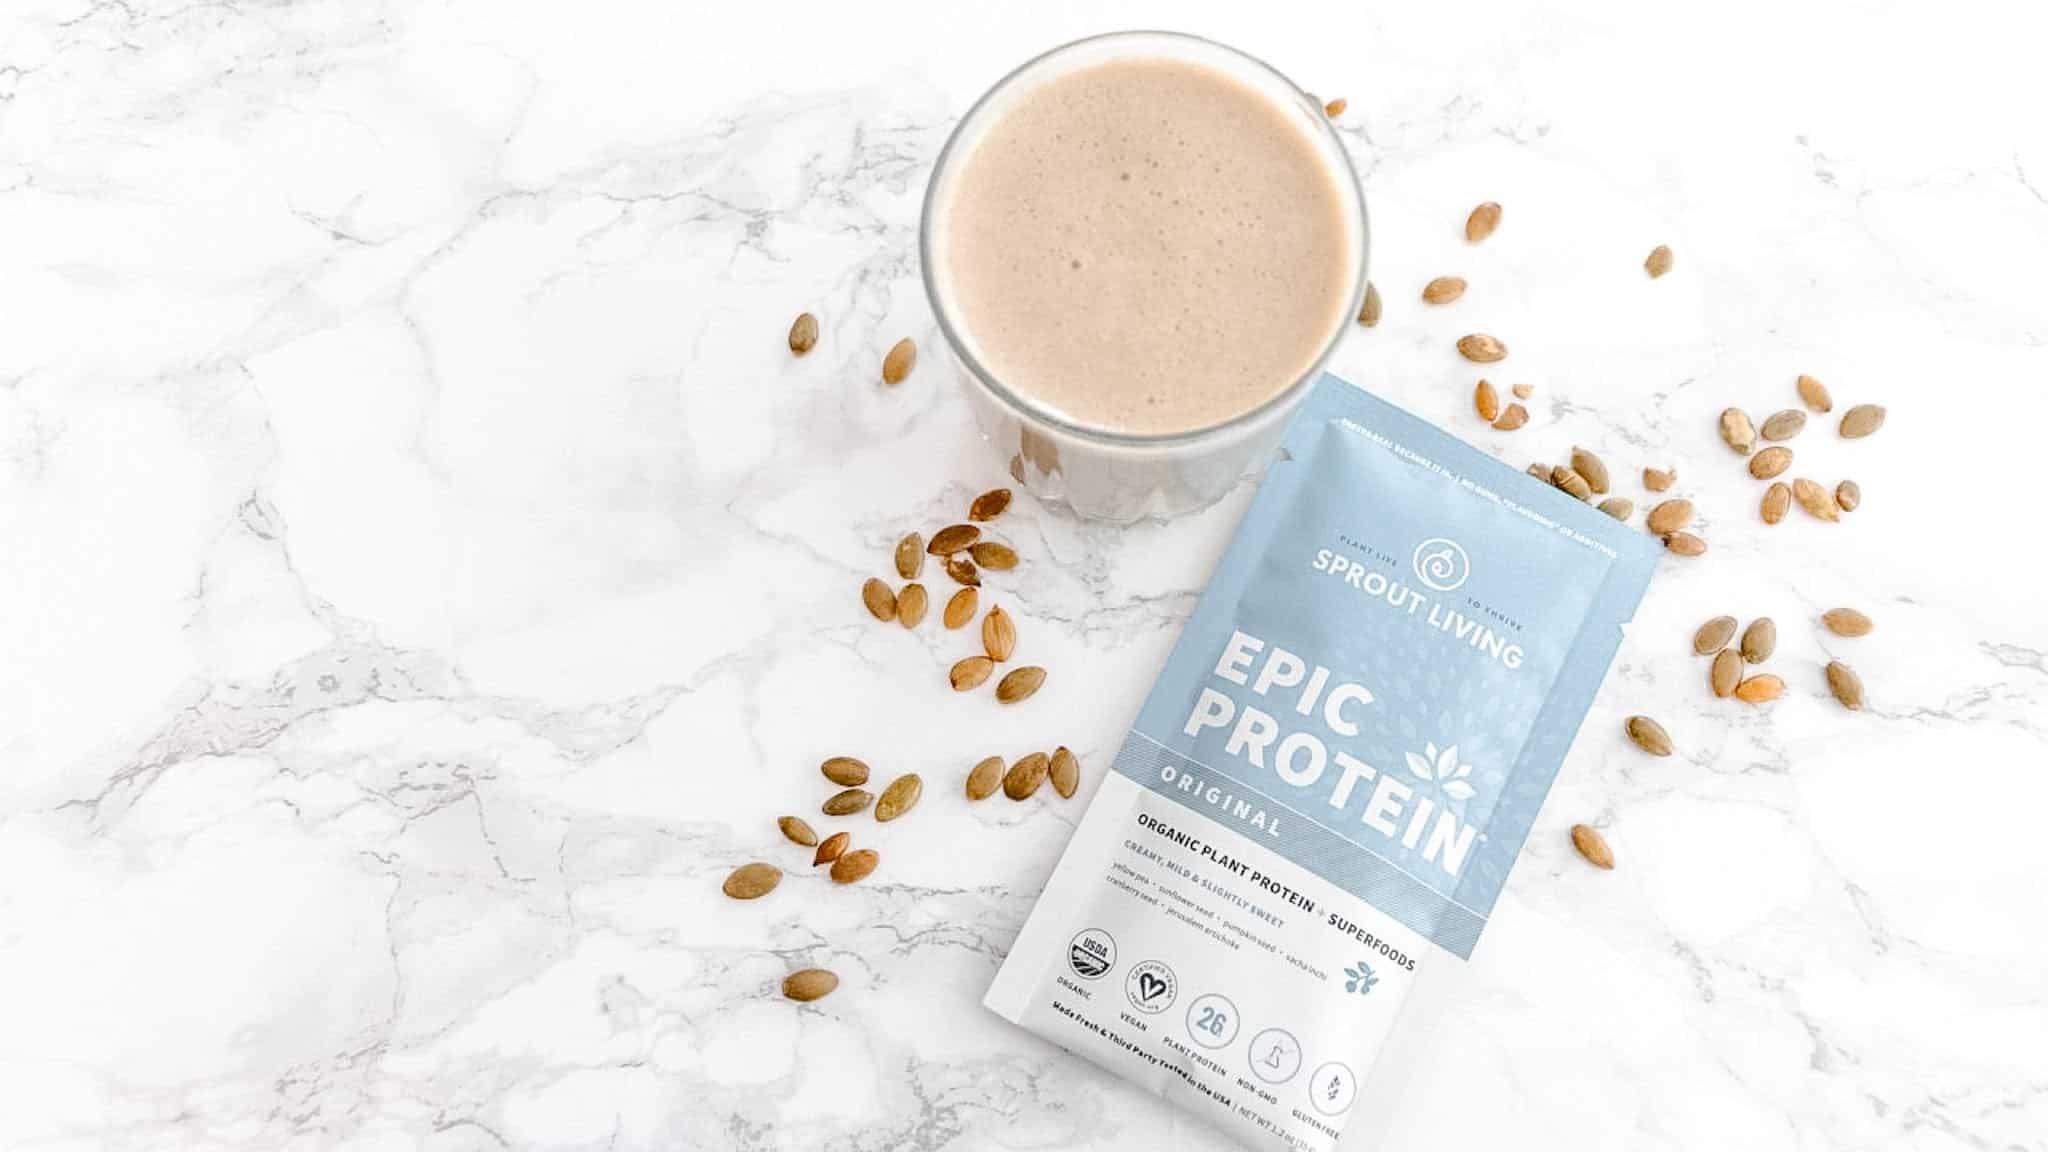 epic vegan protein powder